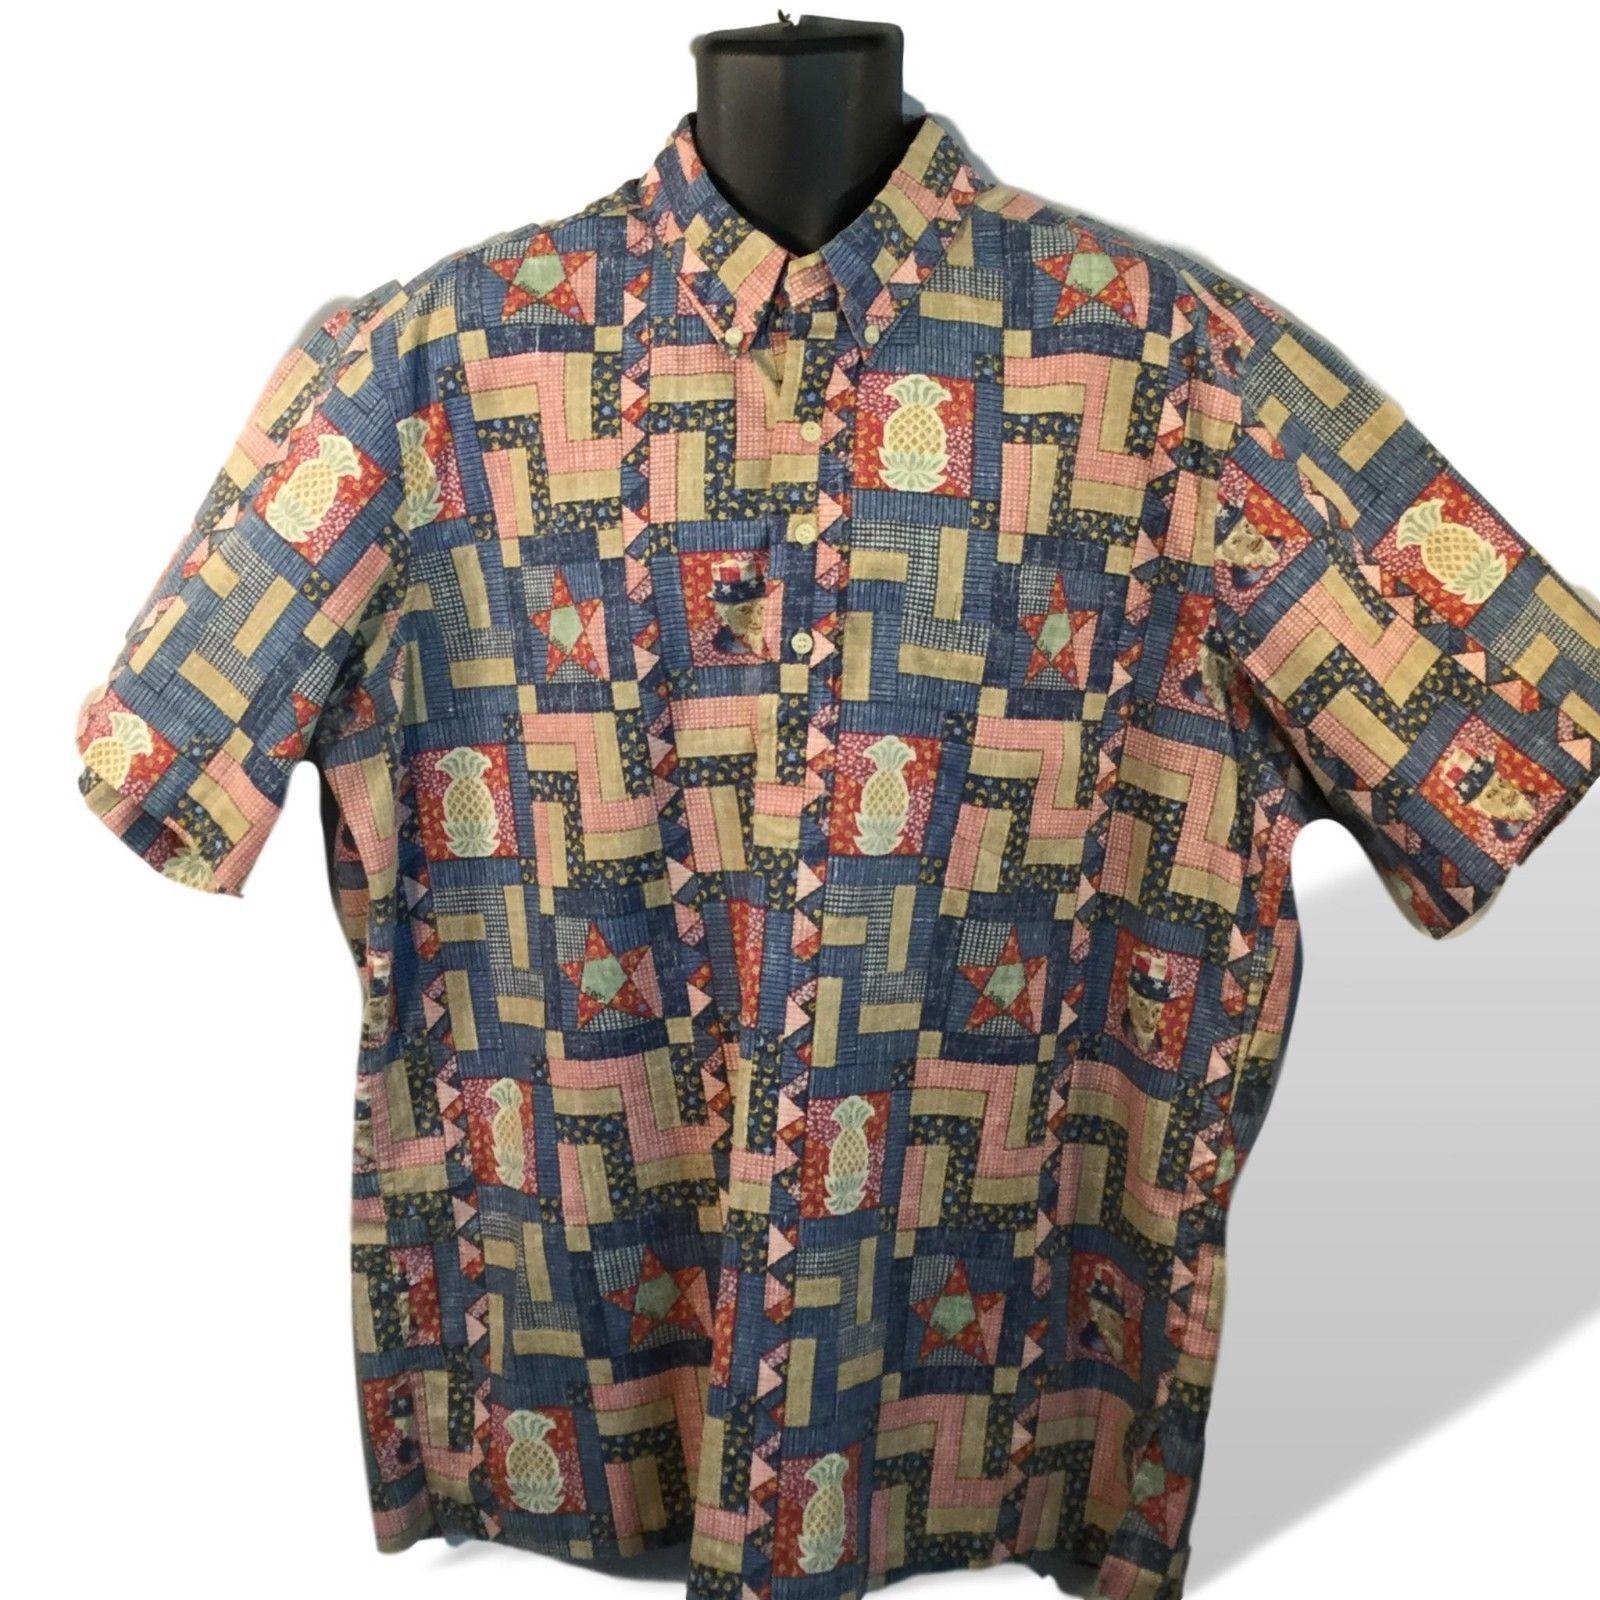 941f31997 Reyn Spooner Millennium 2000 Uncle Sam Hawaiian Shirt Reverse Print  Pullover 2XL - $73.76